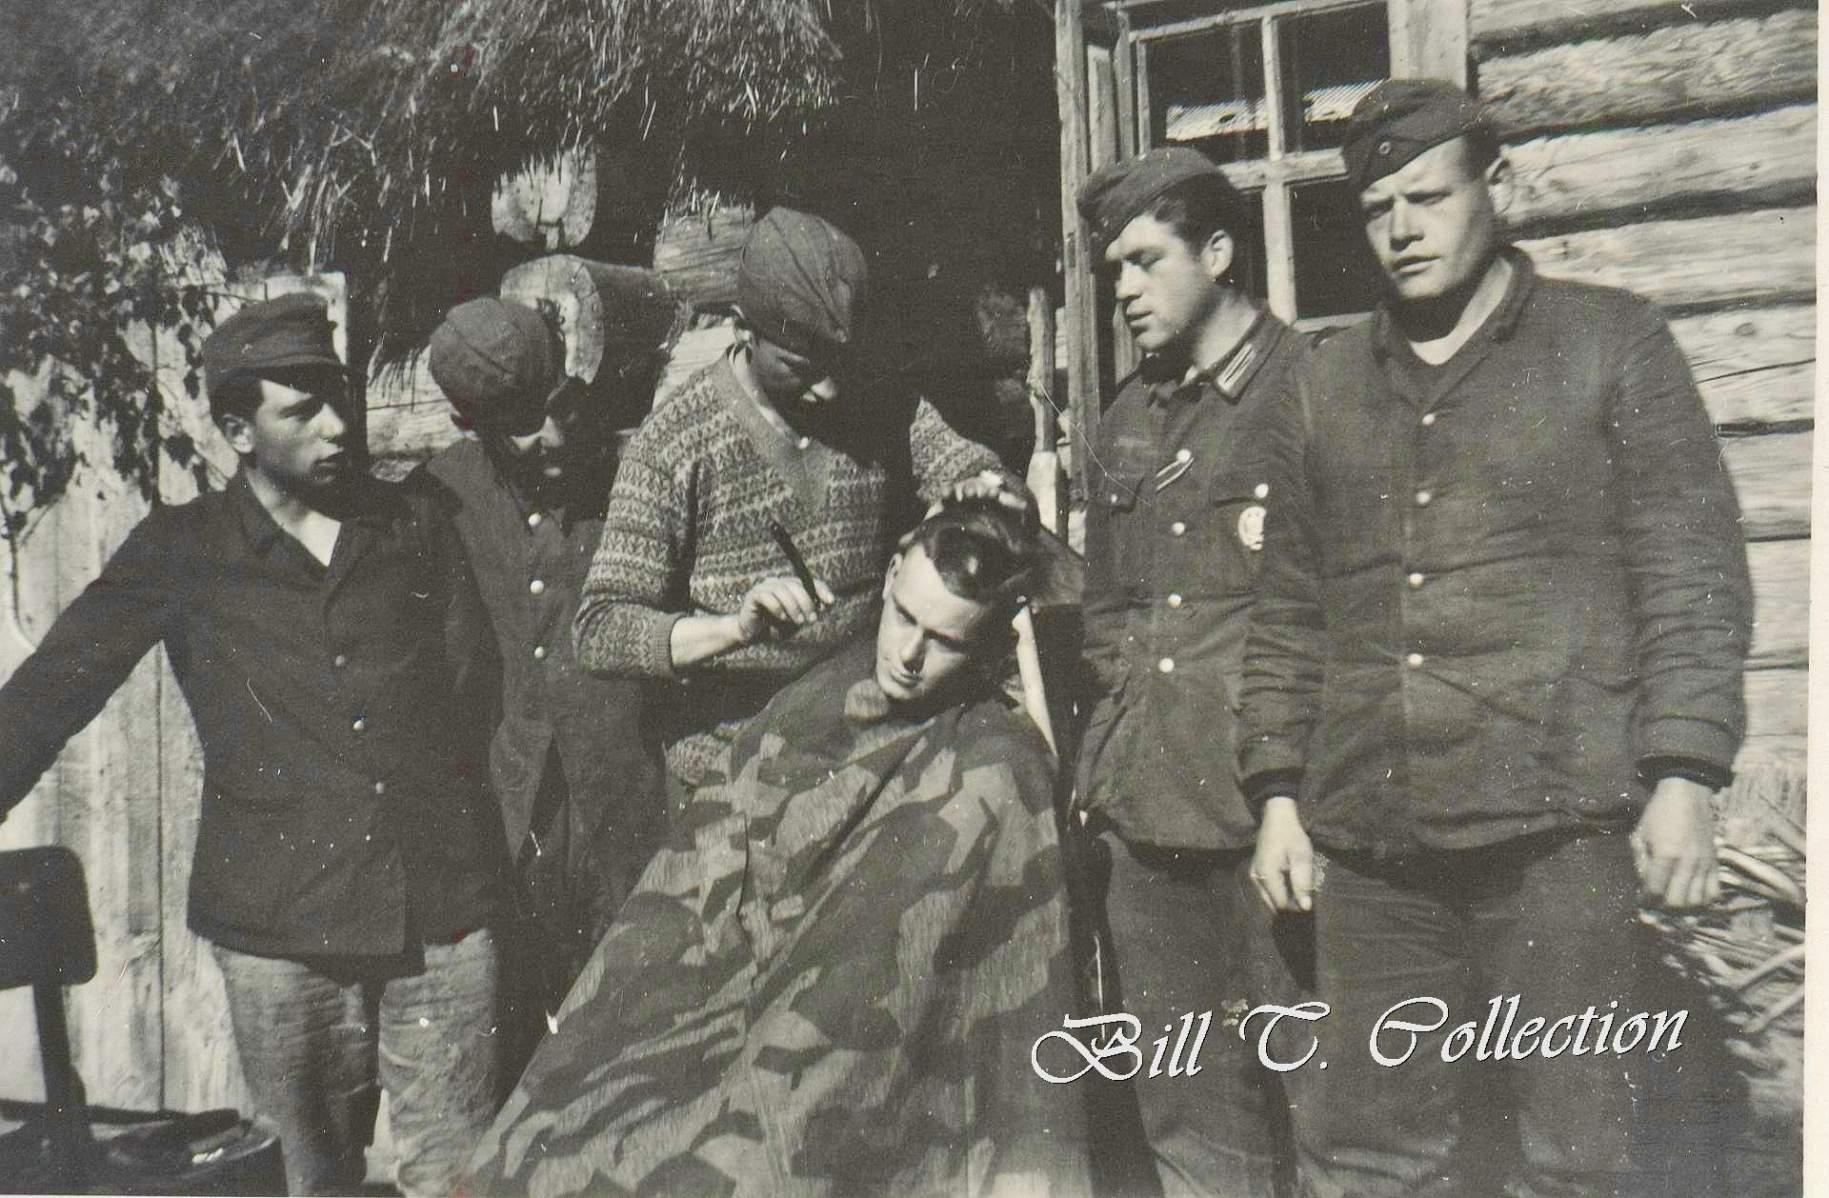 german soldier haircut - photo #35